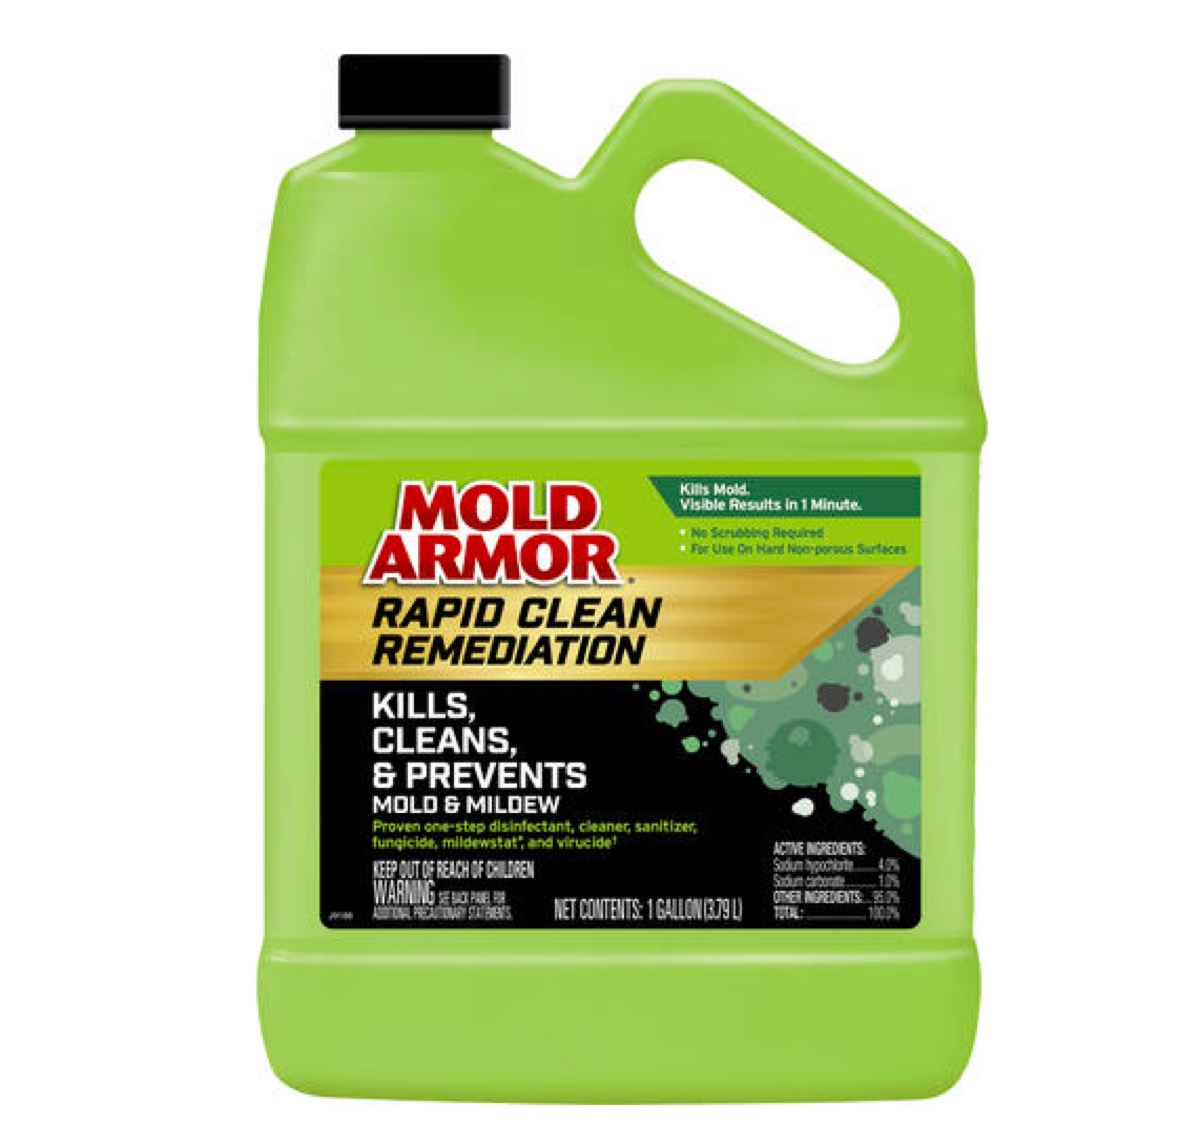 Mold Armor